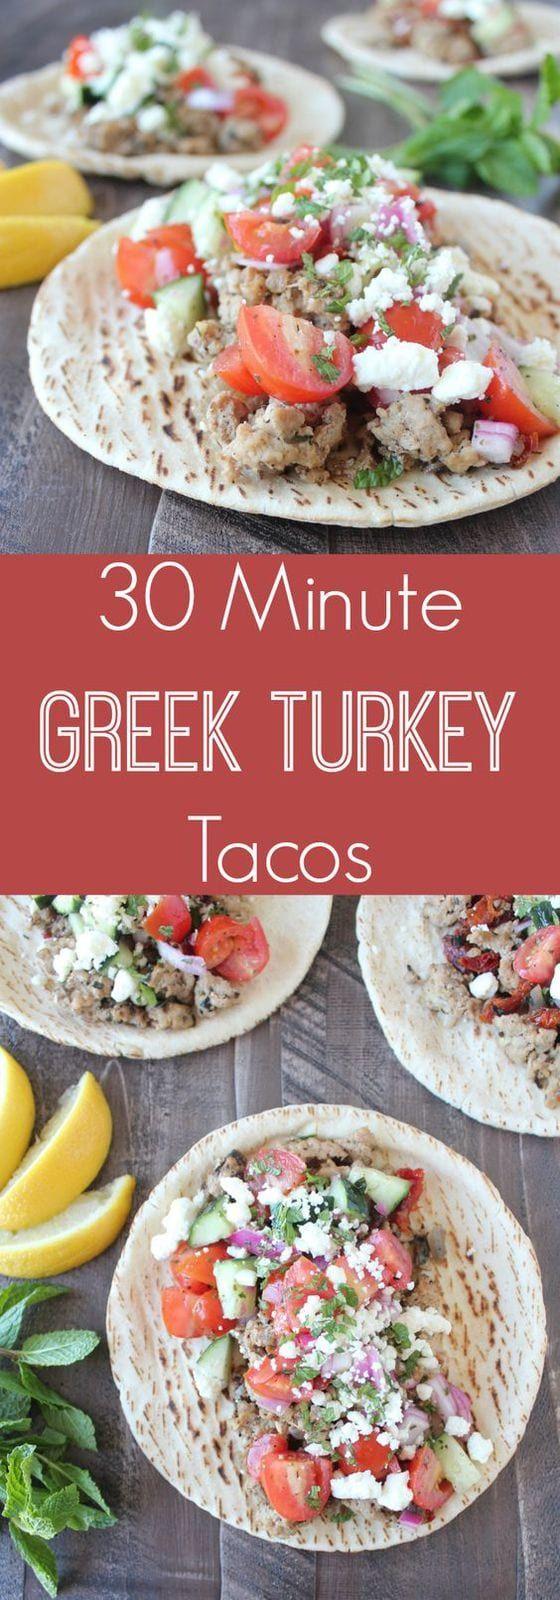 Greek Tacos - AKA Easy Homemade Gyros | WhitneyBond.com